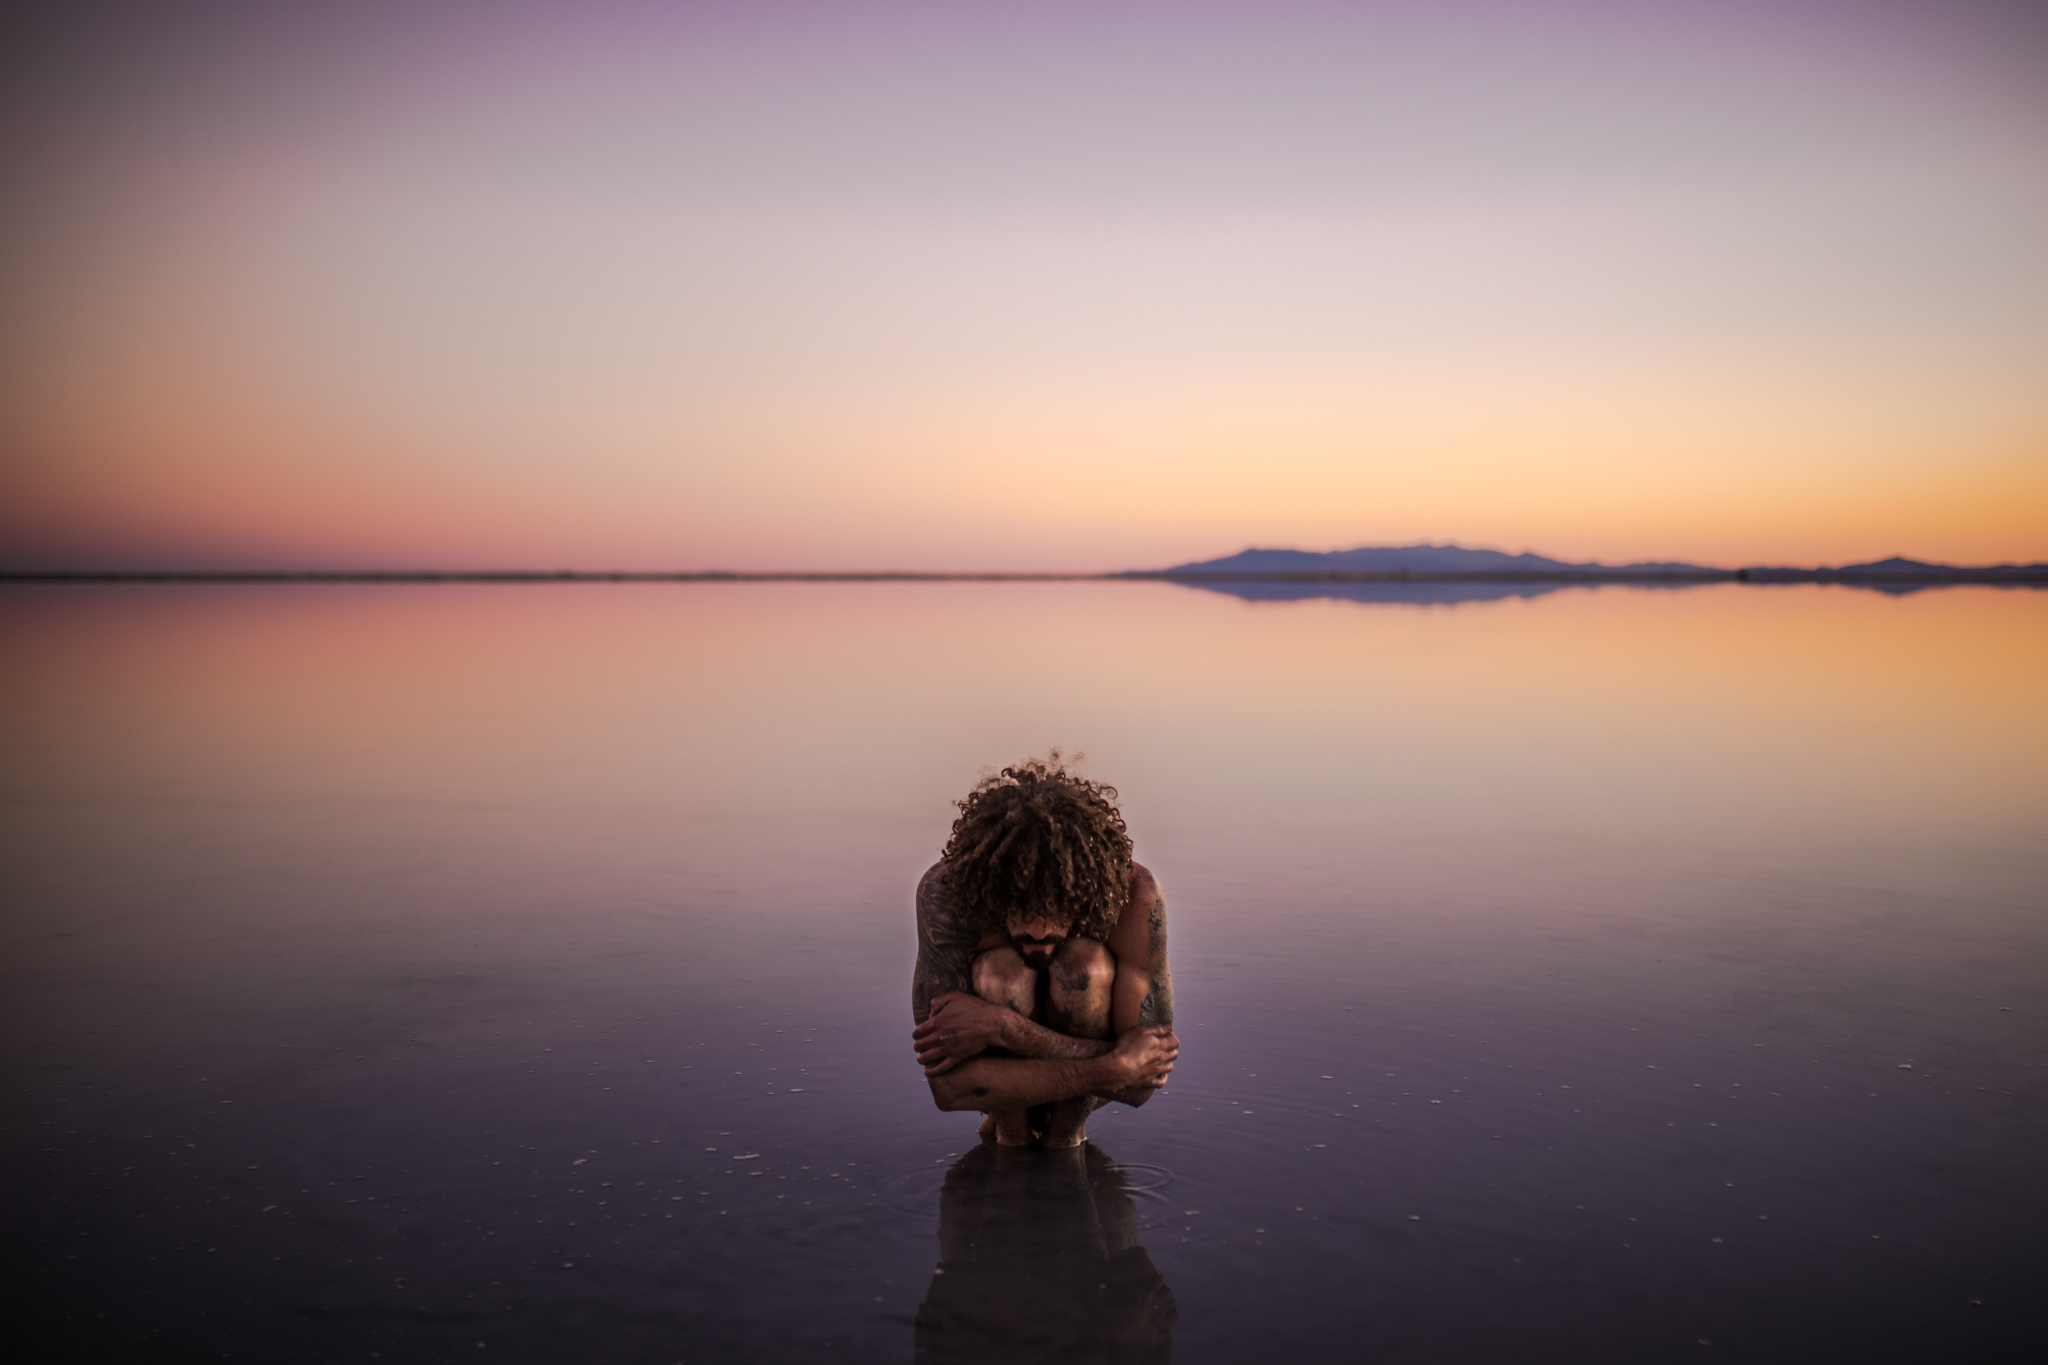 san diego wedding   photographer | tattooed naked man sitting and embracing self on salt flats